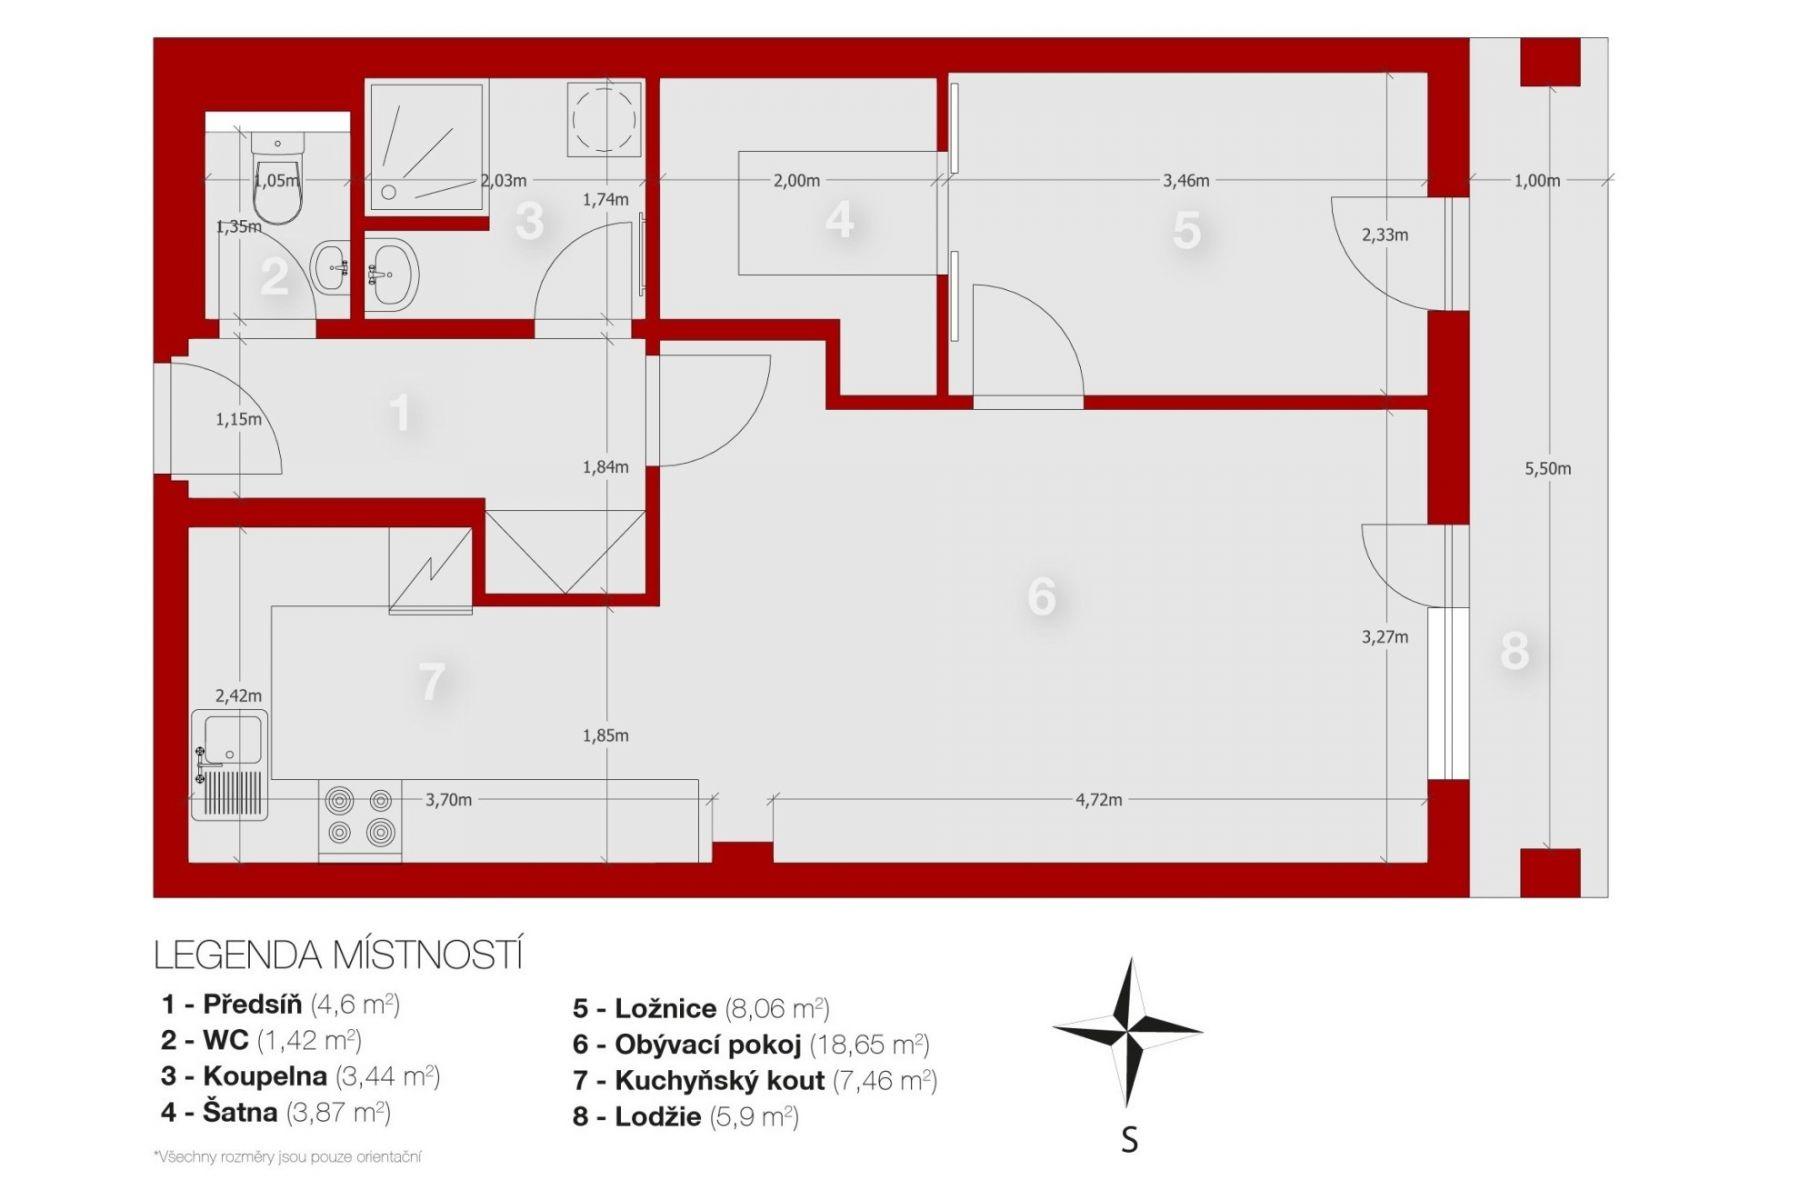 Prodej bytu OV 2+kk/L v novostavbě, Neveklov, okr. Benešov